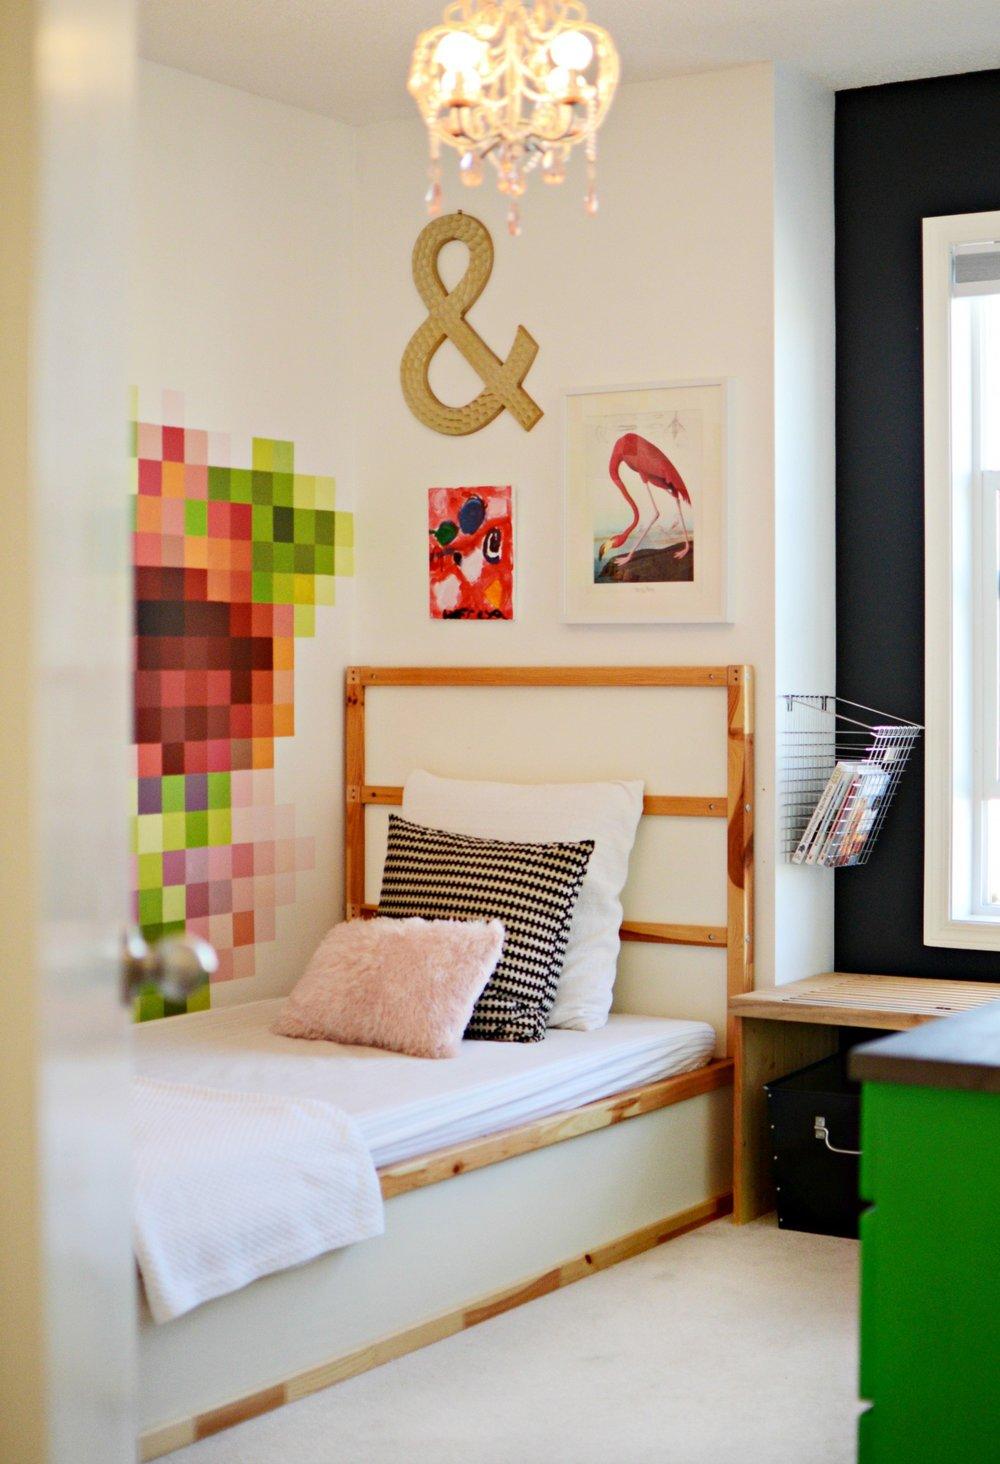 calgary-interior-designer-girls-bedroom-projects.jpg